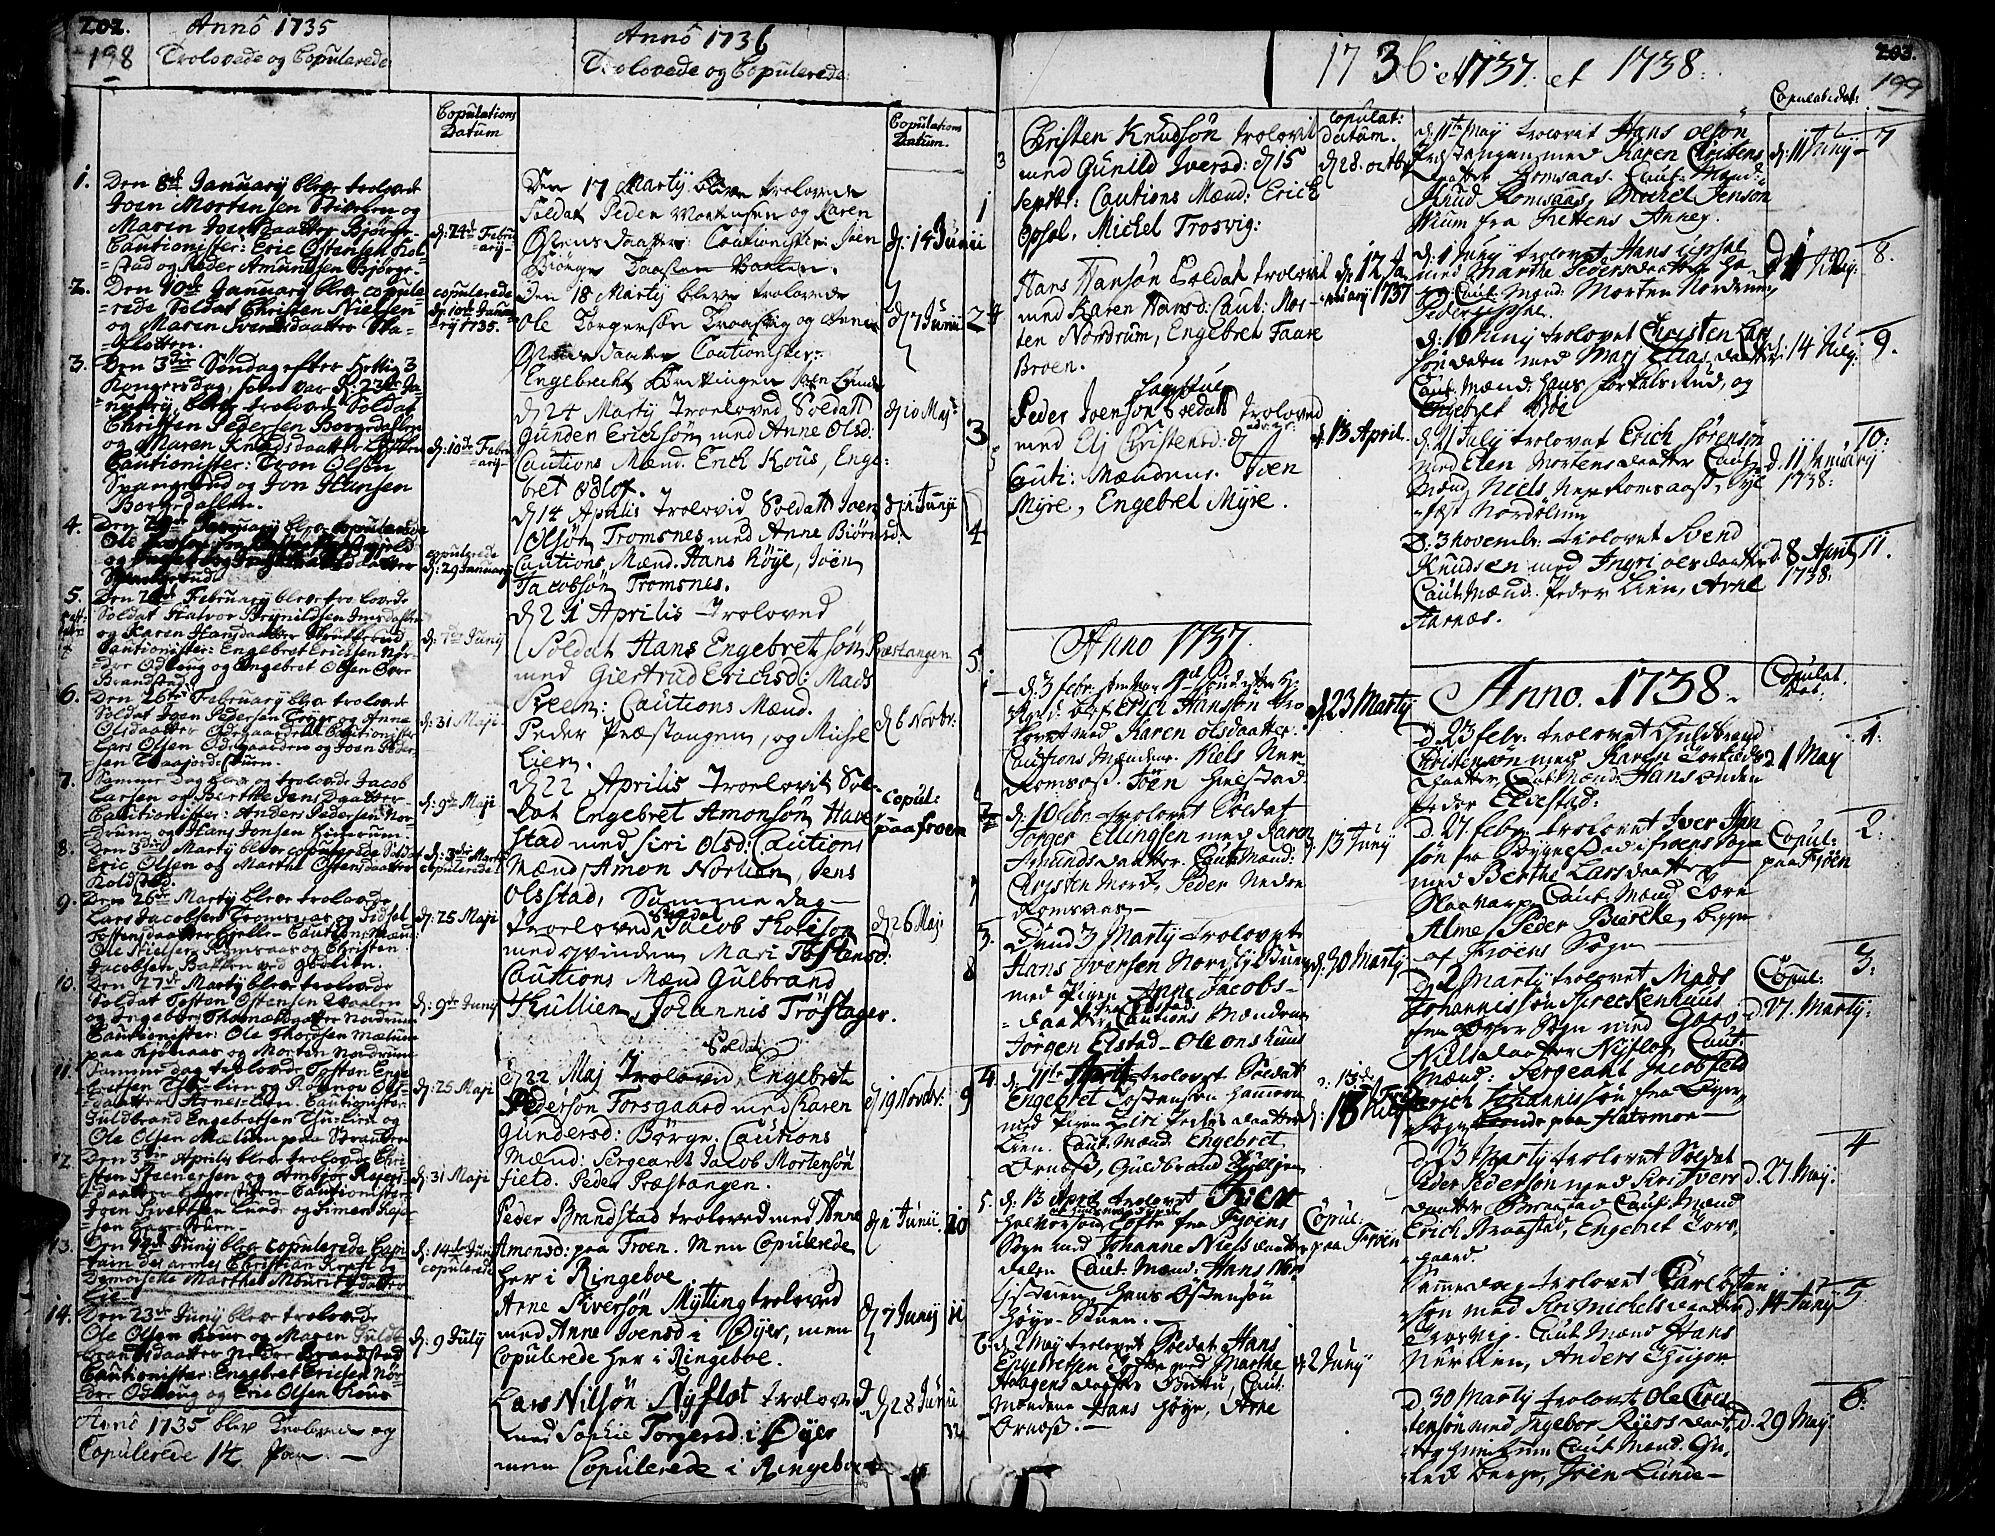 SAH, Ringebu prestekontor, Ministerialbok nr. 2, 1734-1780, s. 198-199